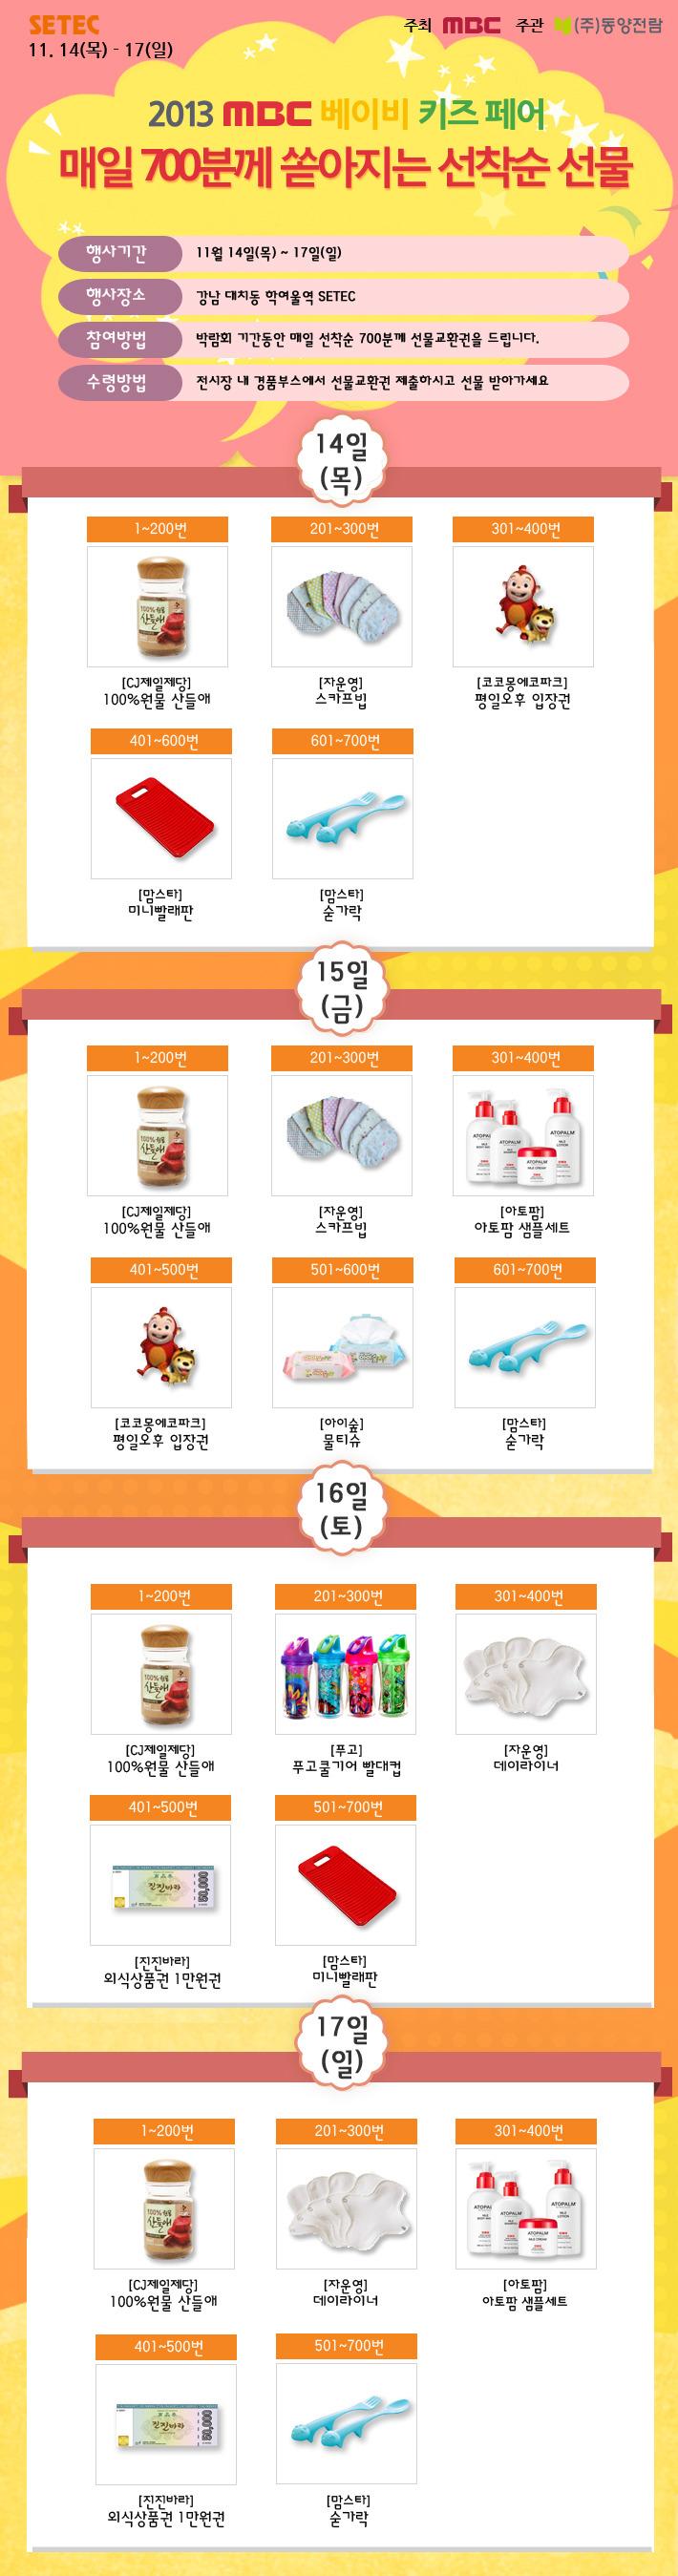 [MBC 베이비 키즈 페어] 선착순 선물& 참가업체 이벤트